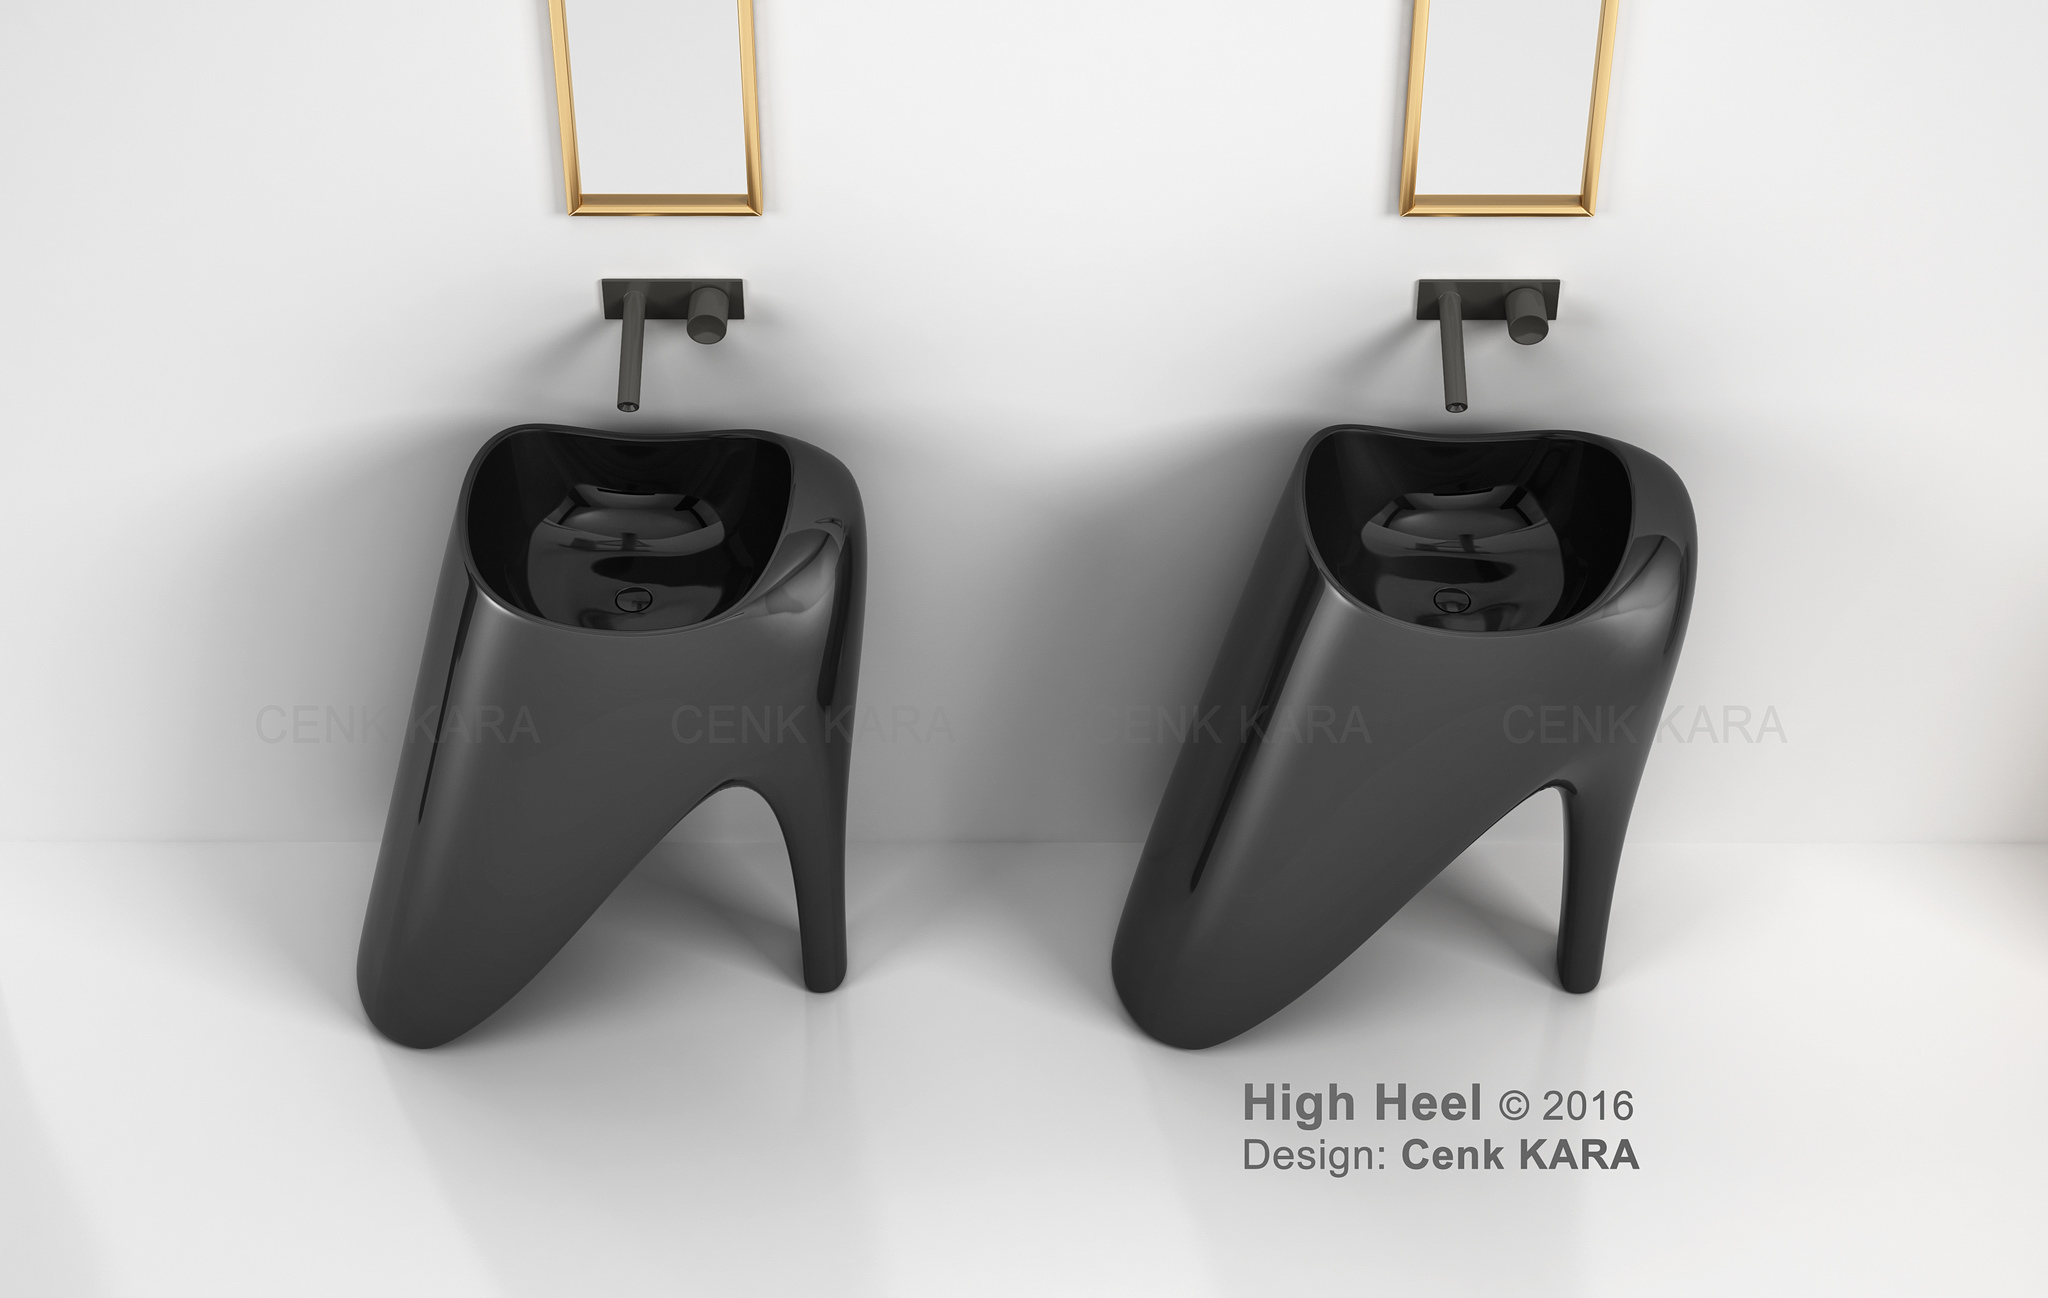 High Heel - freestanding washbasin concept